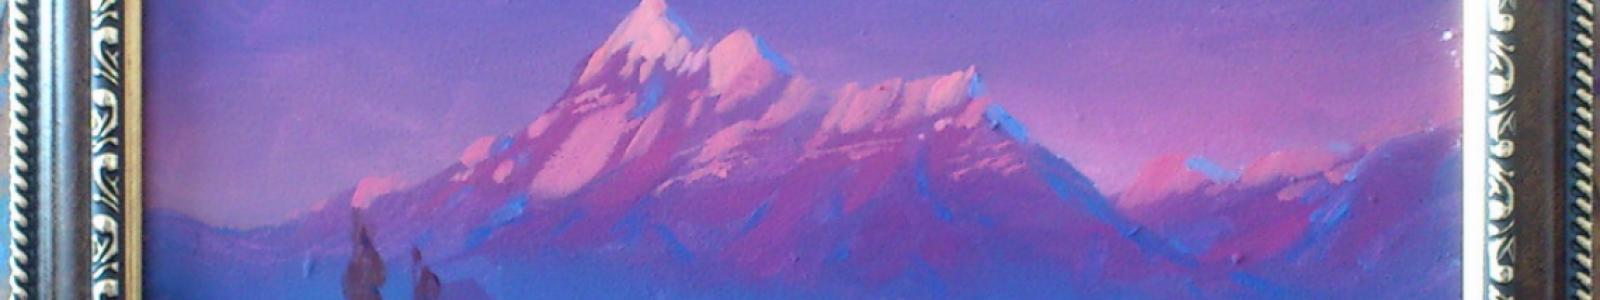 Gallery Painter Vadim Mitkov